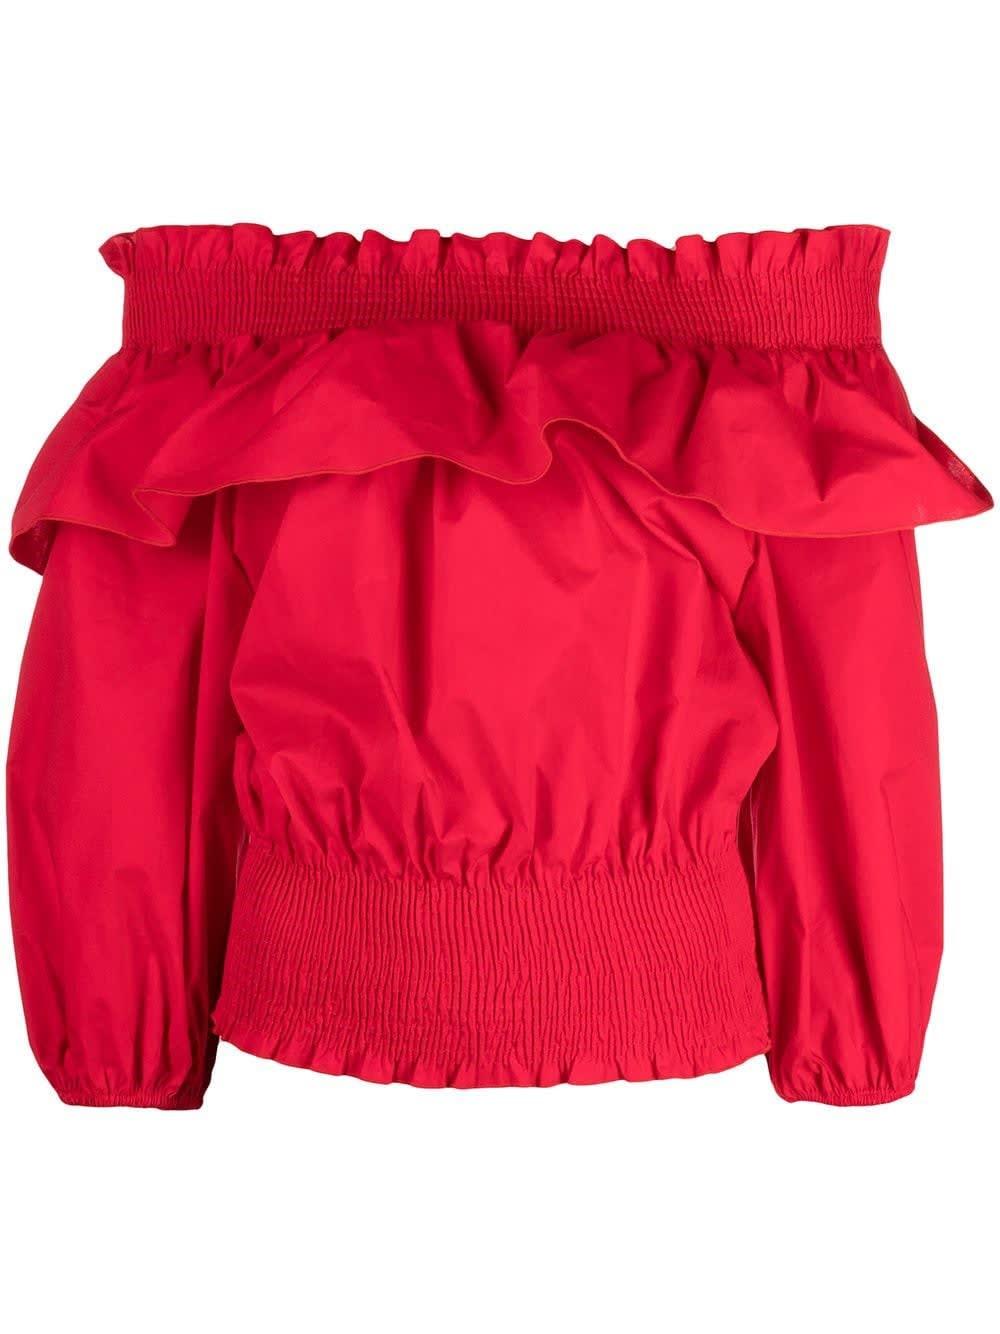 Liu •jo Cottons RED COTTON POPLIN TOP WITH RUFFLES